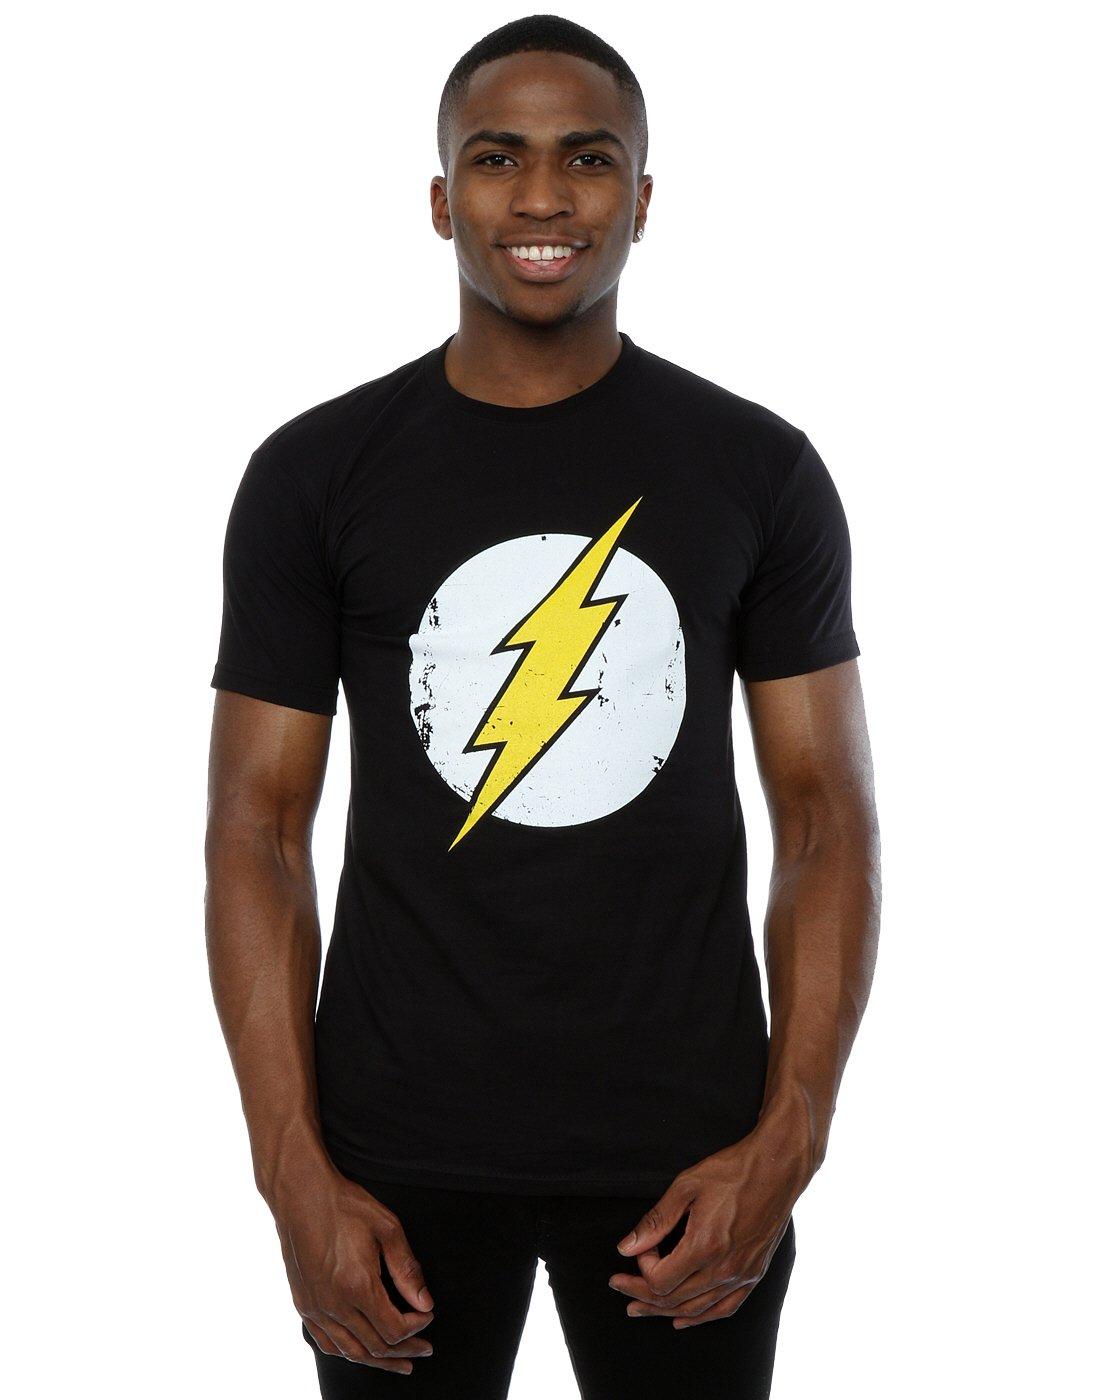 8999b7498a1 DC Comics - Camiseta de Flash con cuello redondo de manga corta para hombre  DC Shoes Pe10793T